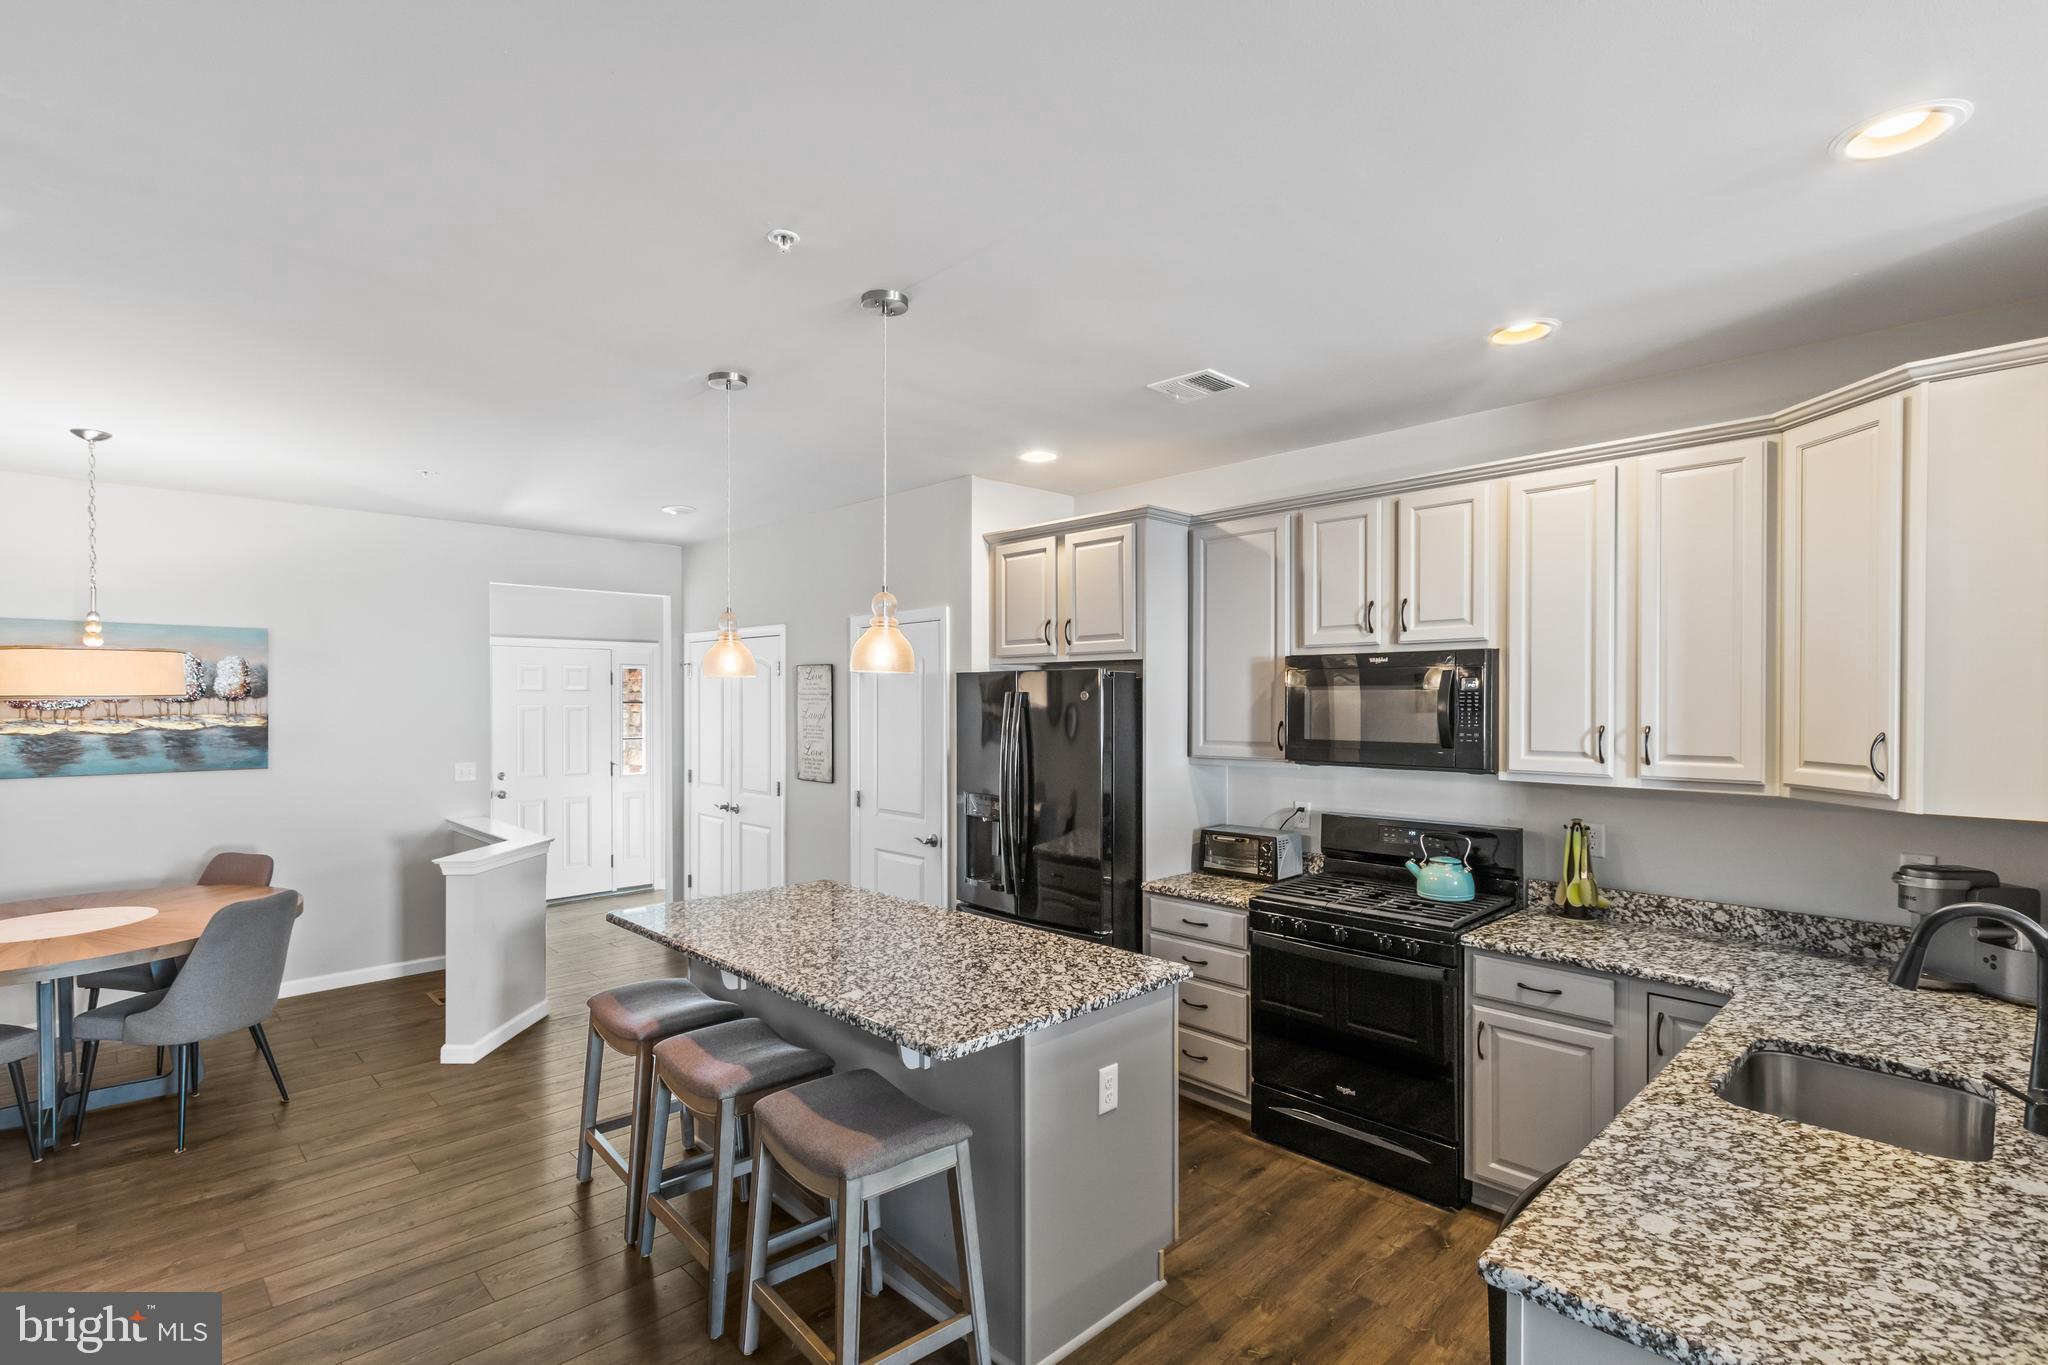 285 WYNDHAM COURT, HARLEYSVILLE, Pennsylvania 19438, 3 Bedrooms Bedrooms, ,3 BathroomsBathrooms,Townhouse,For Sale,285 WYNDHAM COURT,PAMC681962